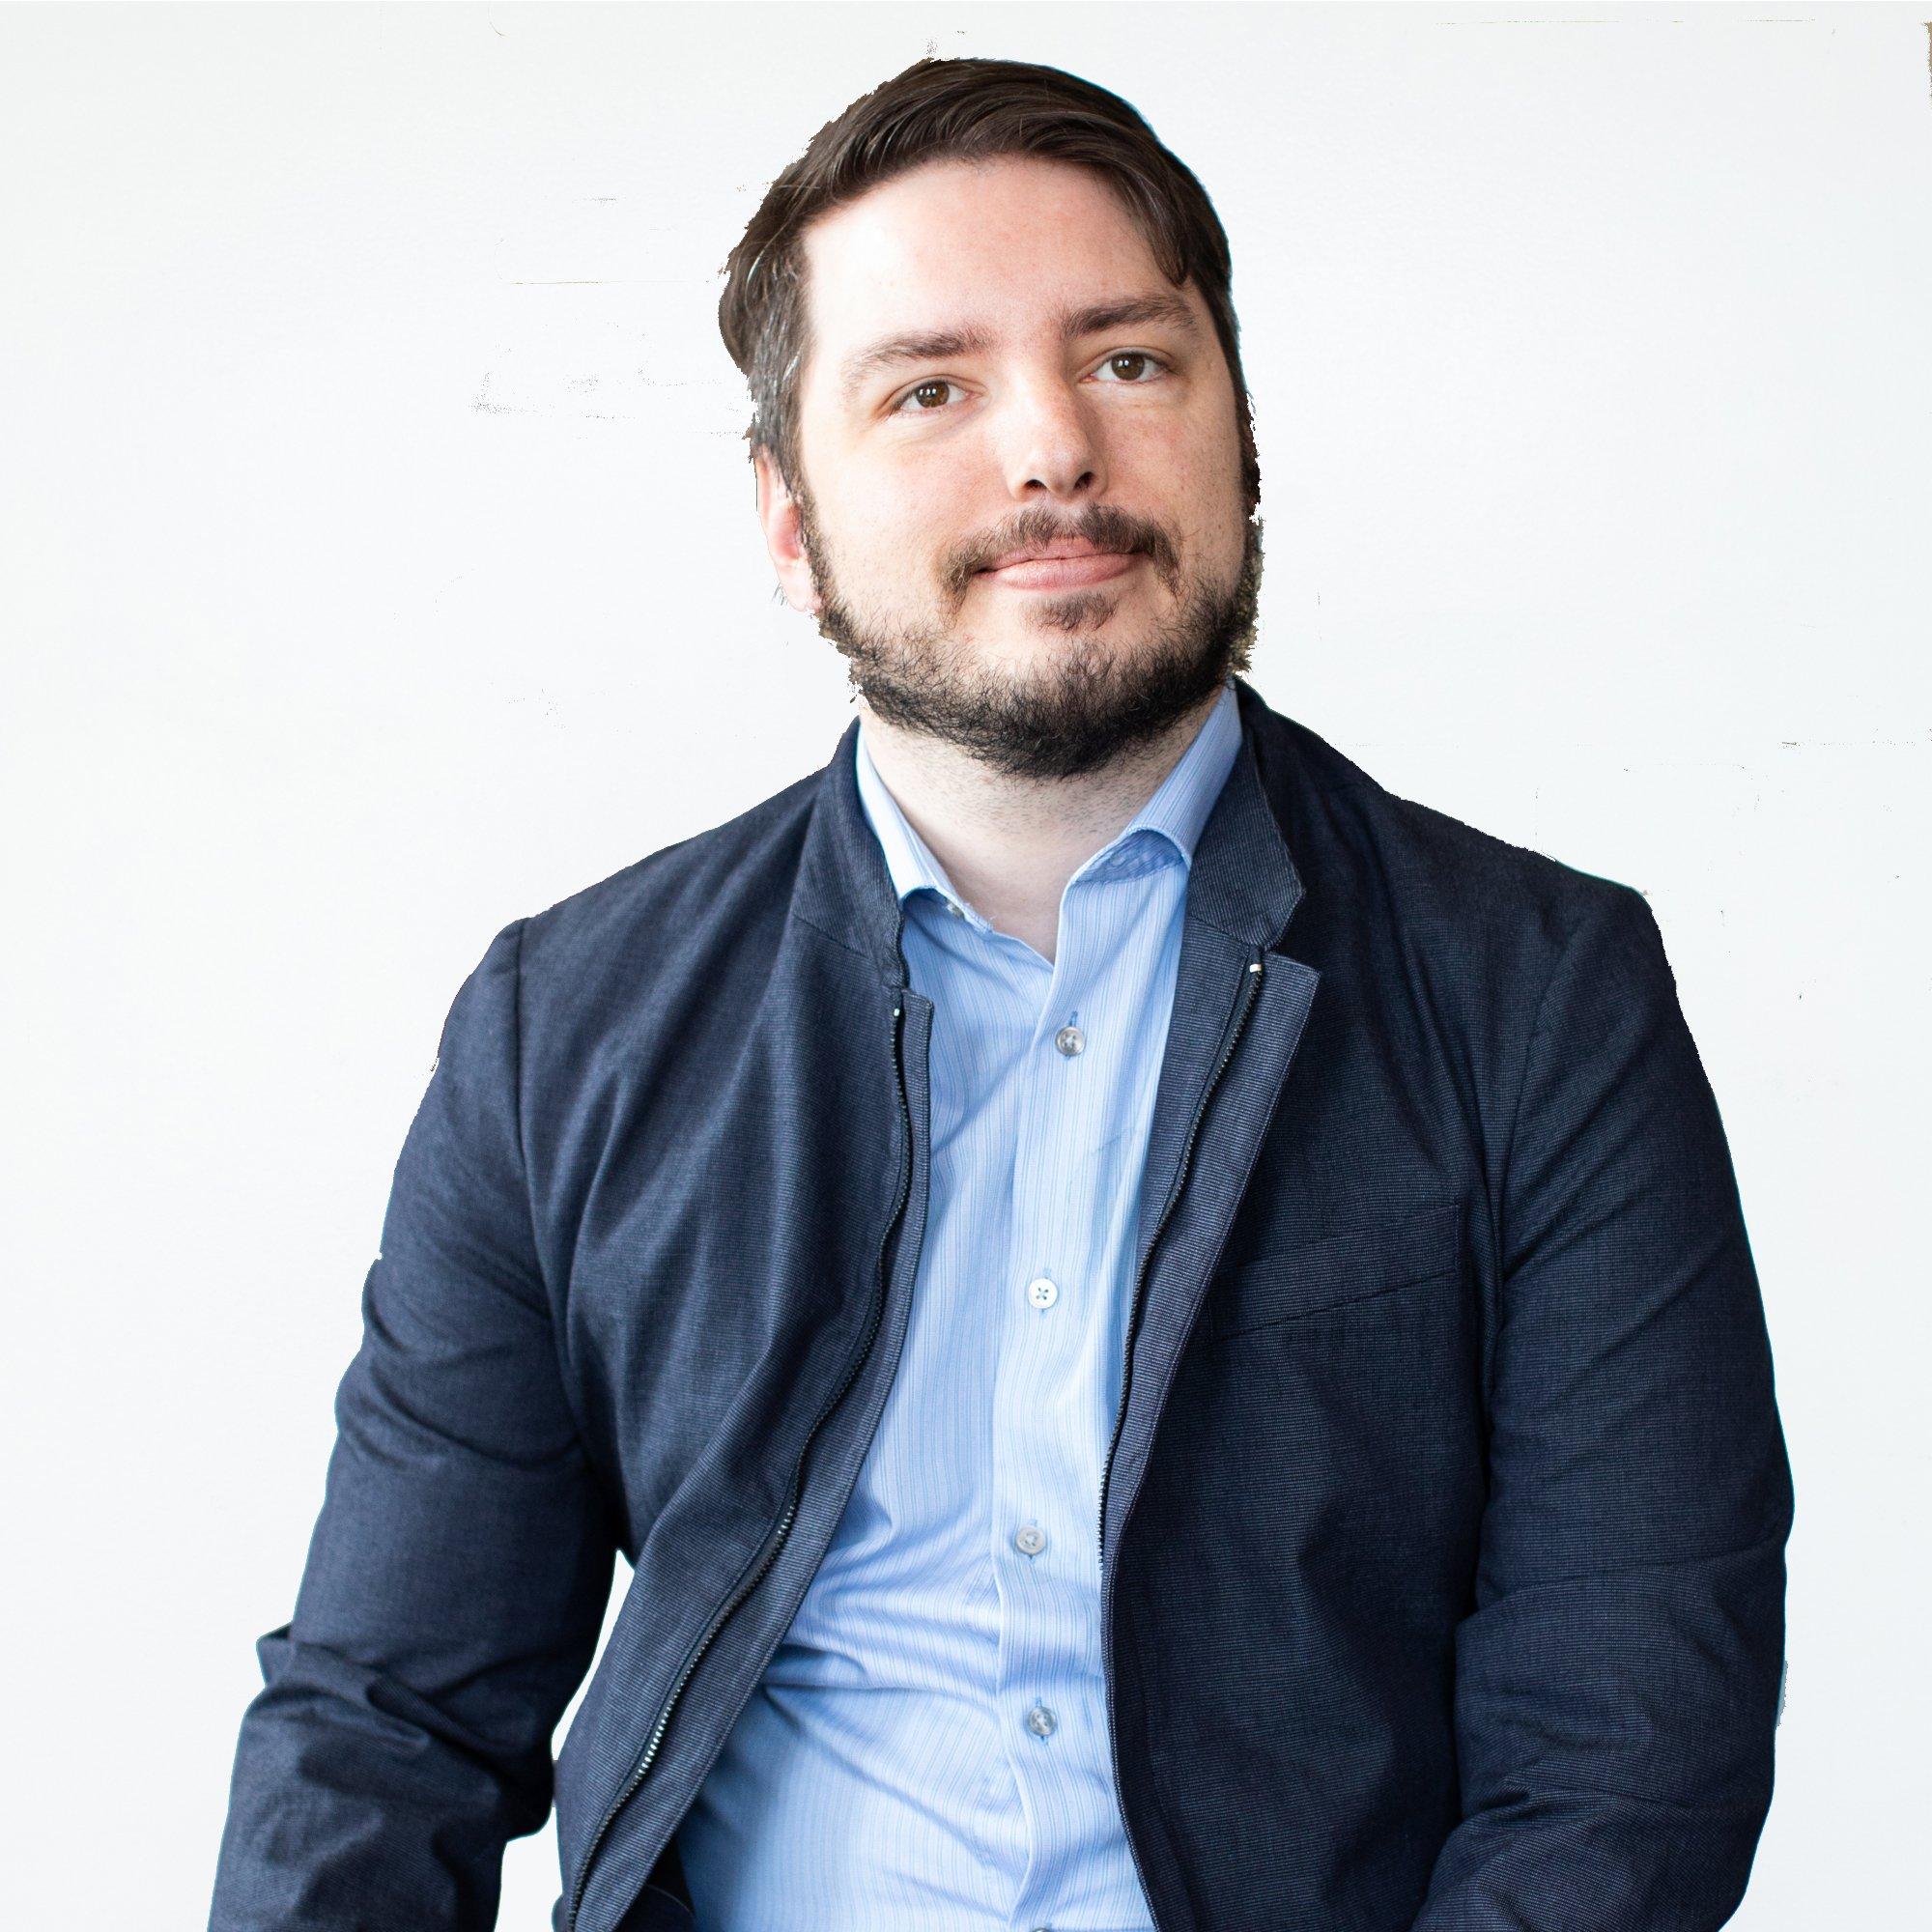 https://cdn2.hubspot.net/hubfs/4436636/Bernardo%20Restrepo%20AdvisorEngine2.jpg